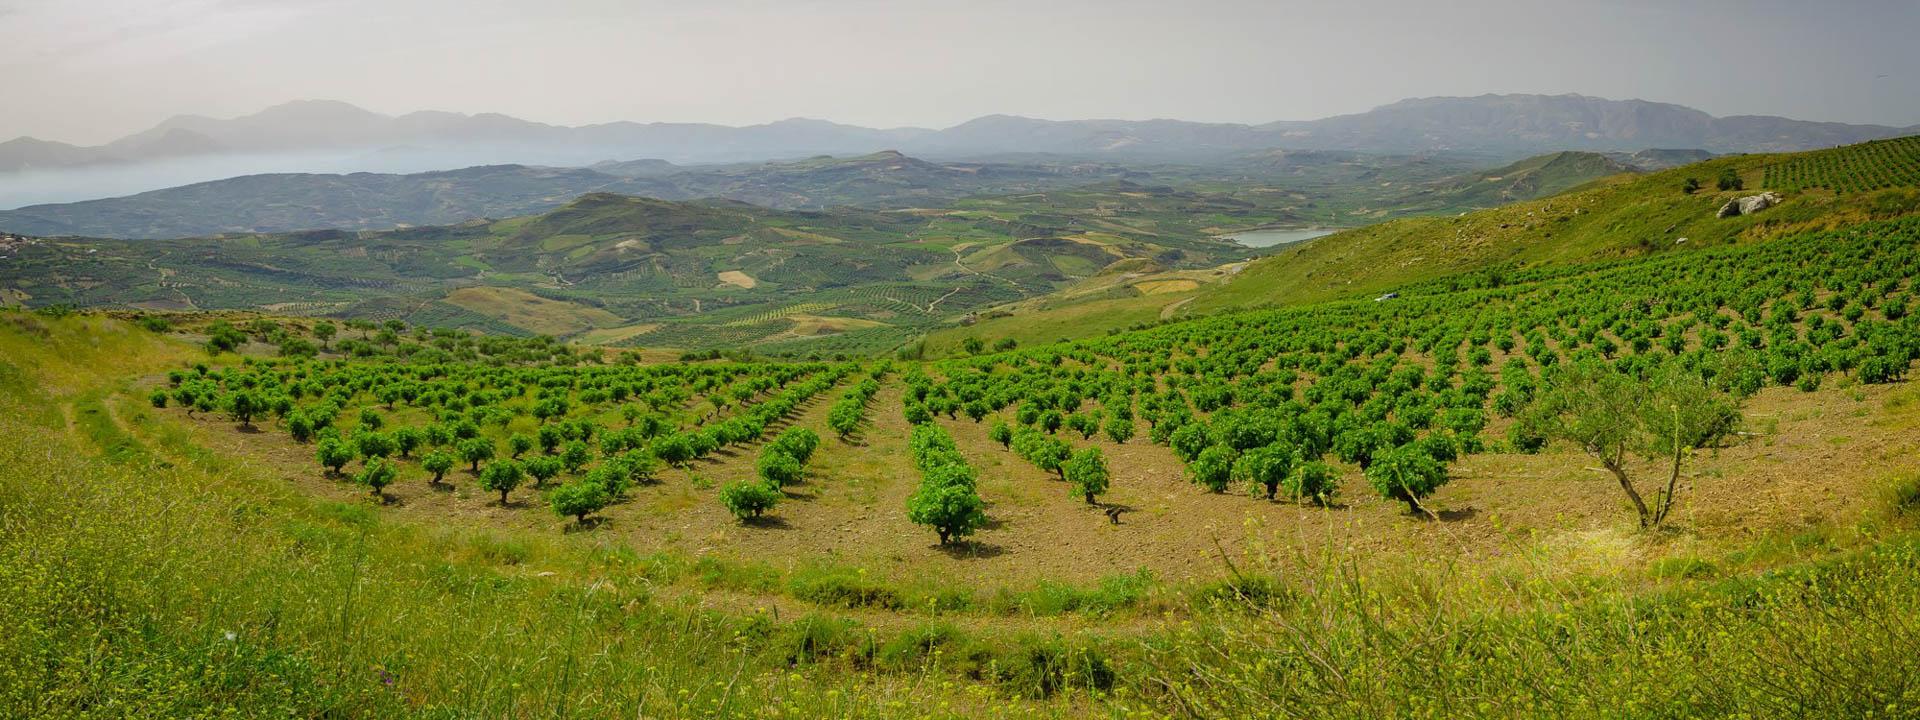 Vilana.Pirovolikes.Vineyard.Photo.jpg